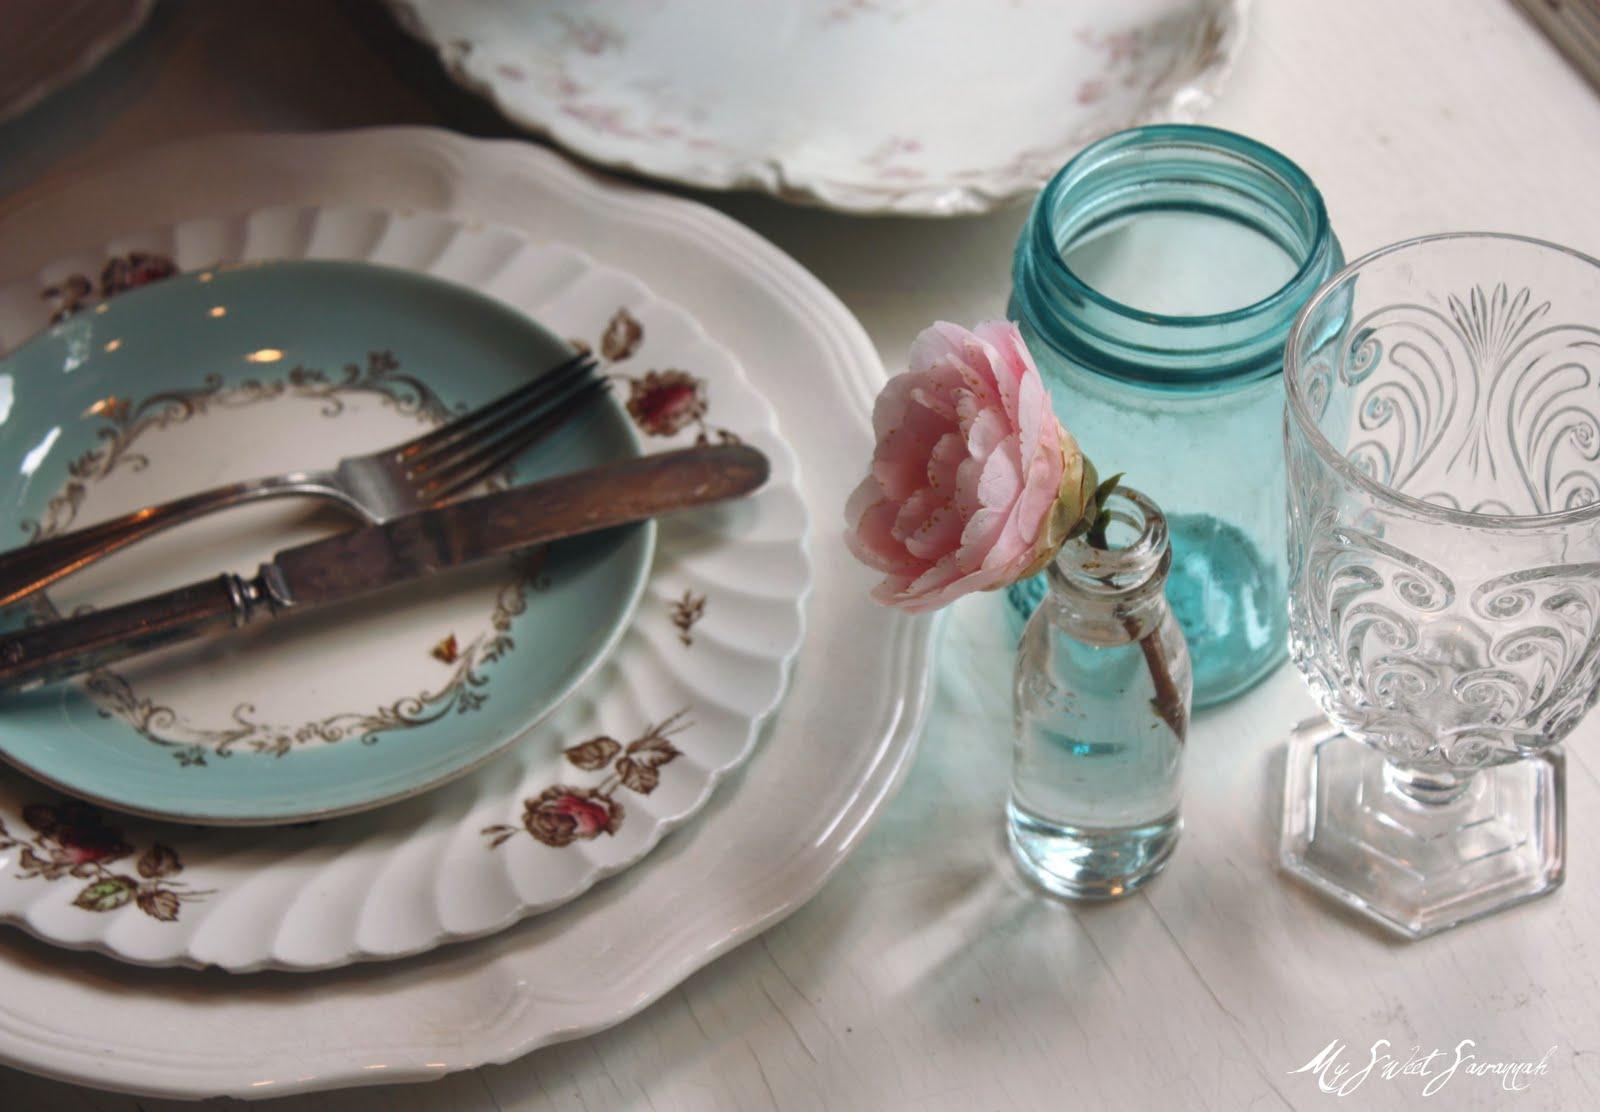 My Sweet Savannah Vintage Table Settings